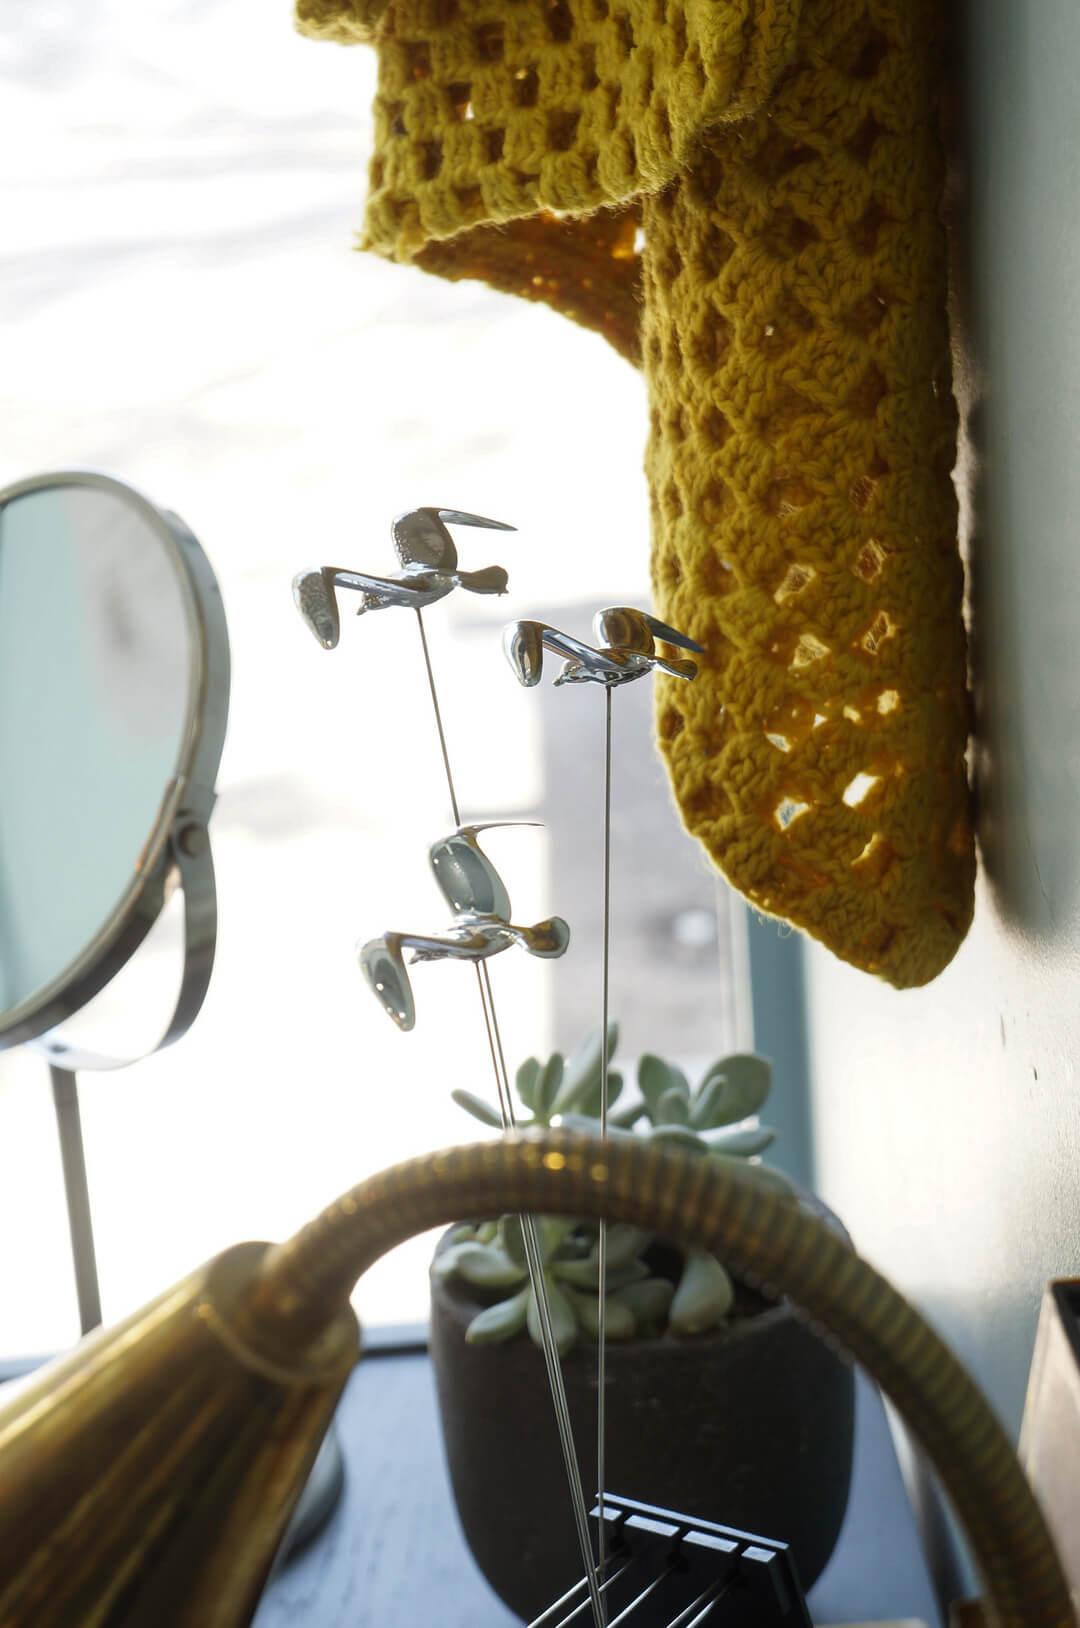 Vintage KINETIC ART Seagull Interior/ヴィンテージ キネティックアート カモメ シーガル イシグロ オタギリ インテリア